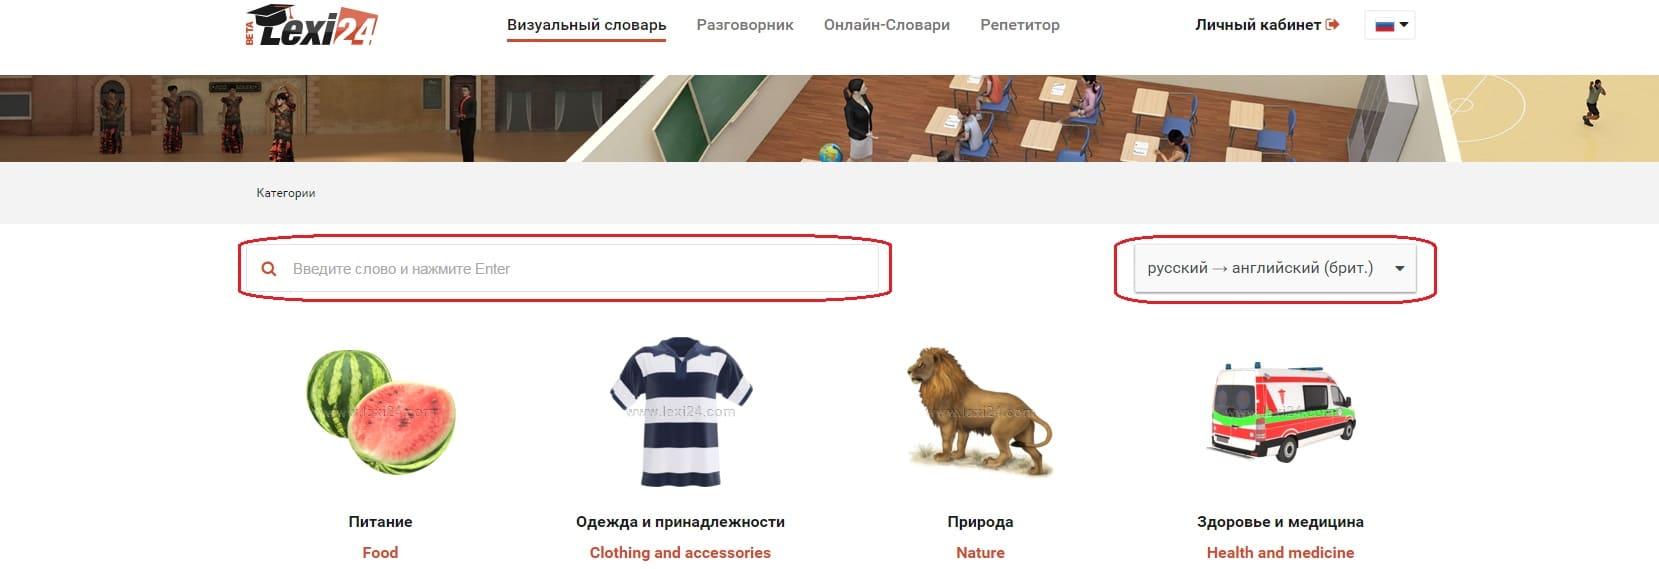 онлайн-словарь